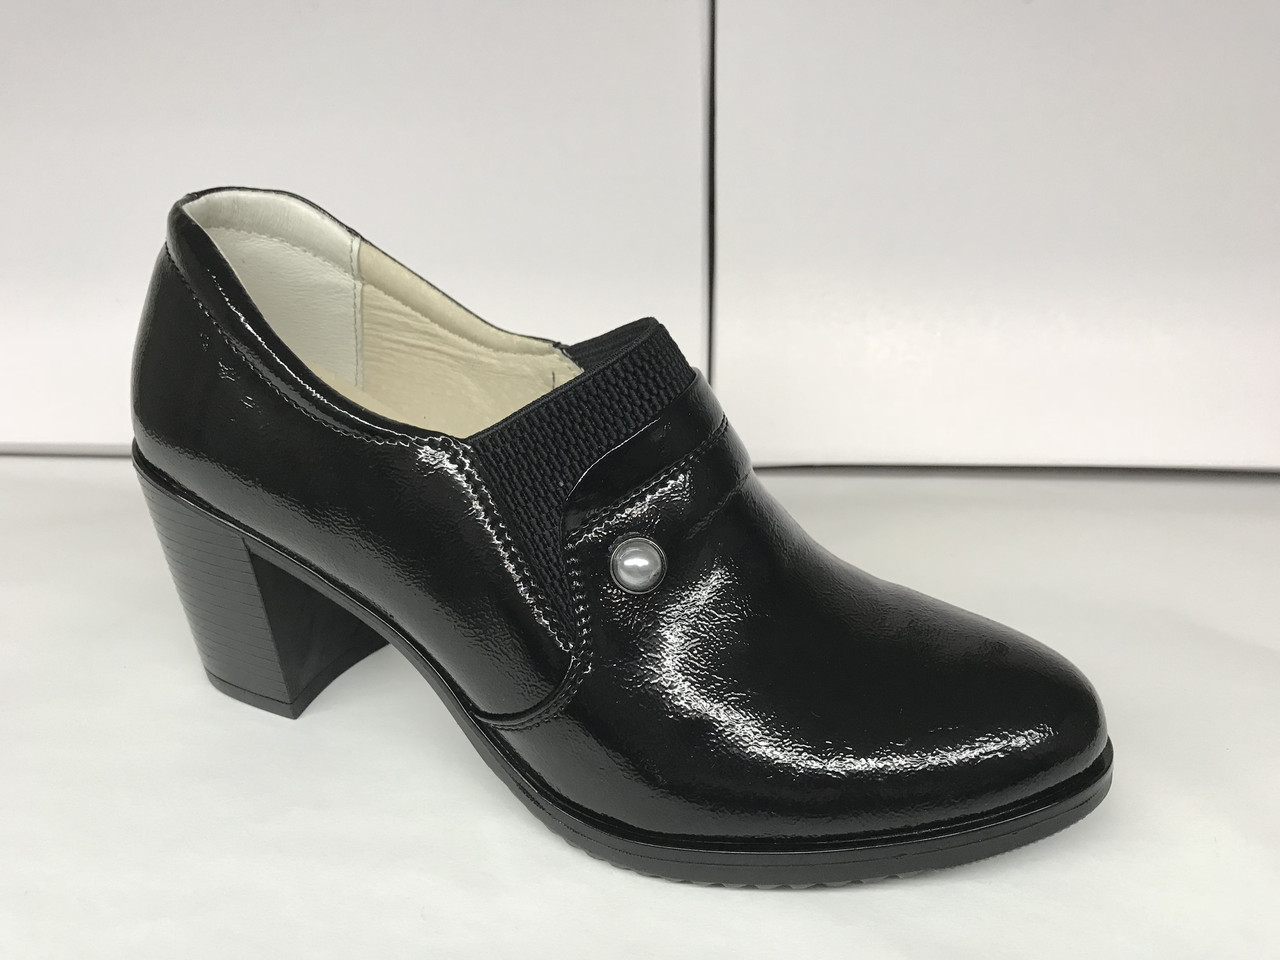 e0adf4a8d56b Женские туфли на низком каблуке. Украинский бренд. Опт и розница ...